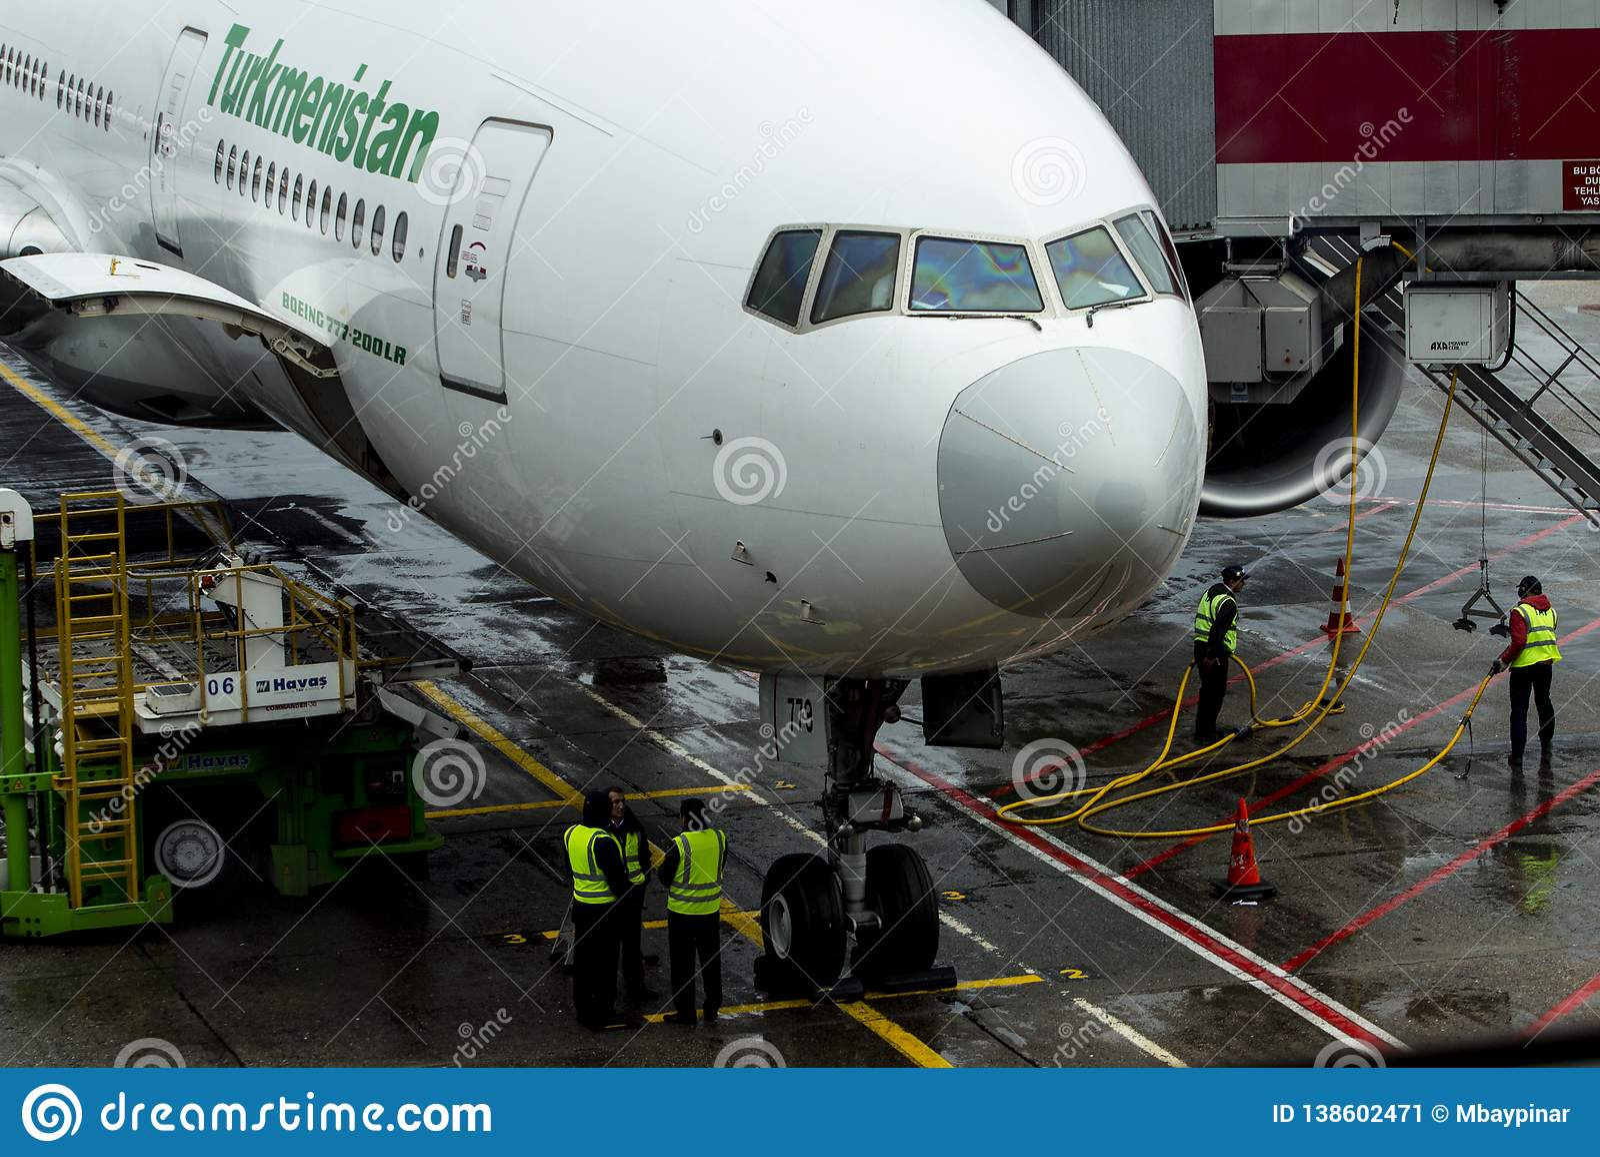 Yesilkoy, Istanbul / Turkey November 28th, 2018: Turkmenistan Airlines Boeing 777-200LR, in Istanbul Ataturk International Airport